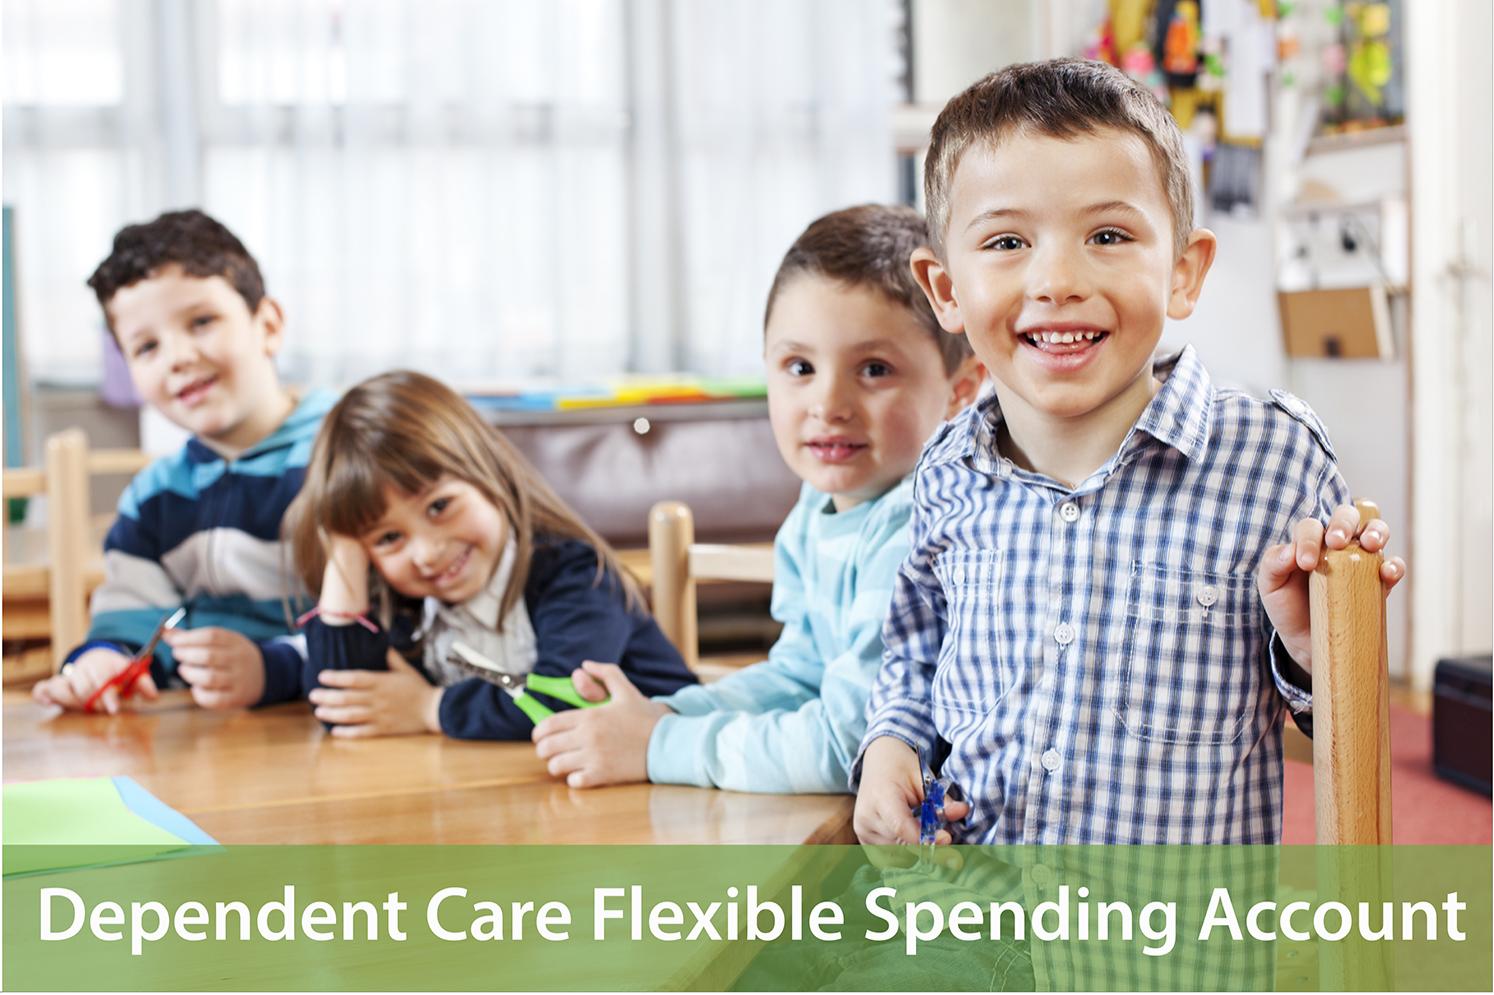 Dependent Care Flexible Spending Accounts (FSA)